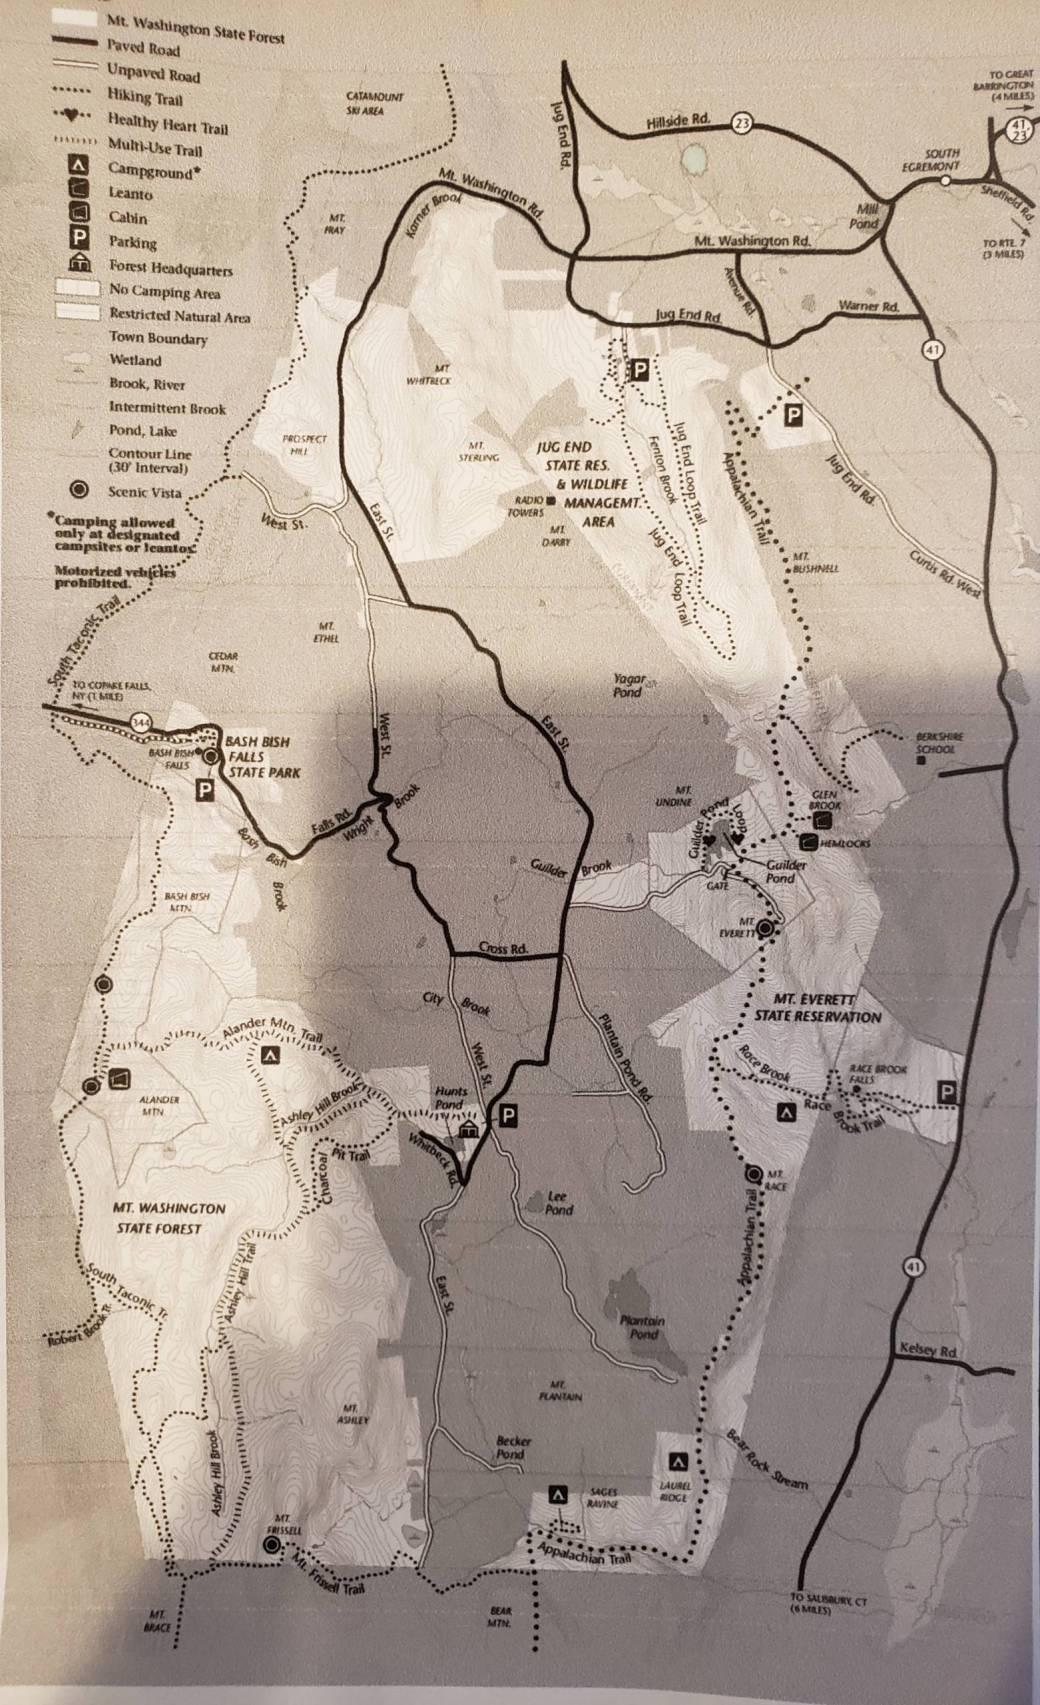 Mount Washington Mount Everett State Reservation JPG